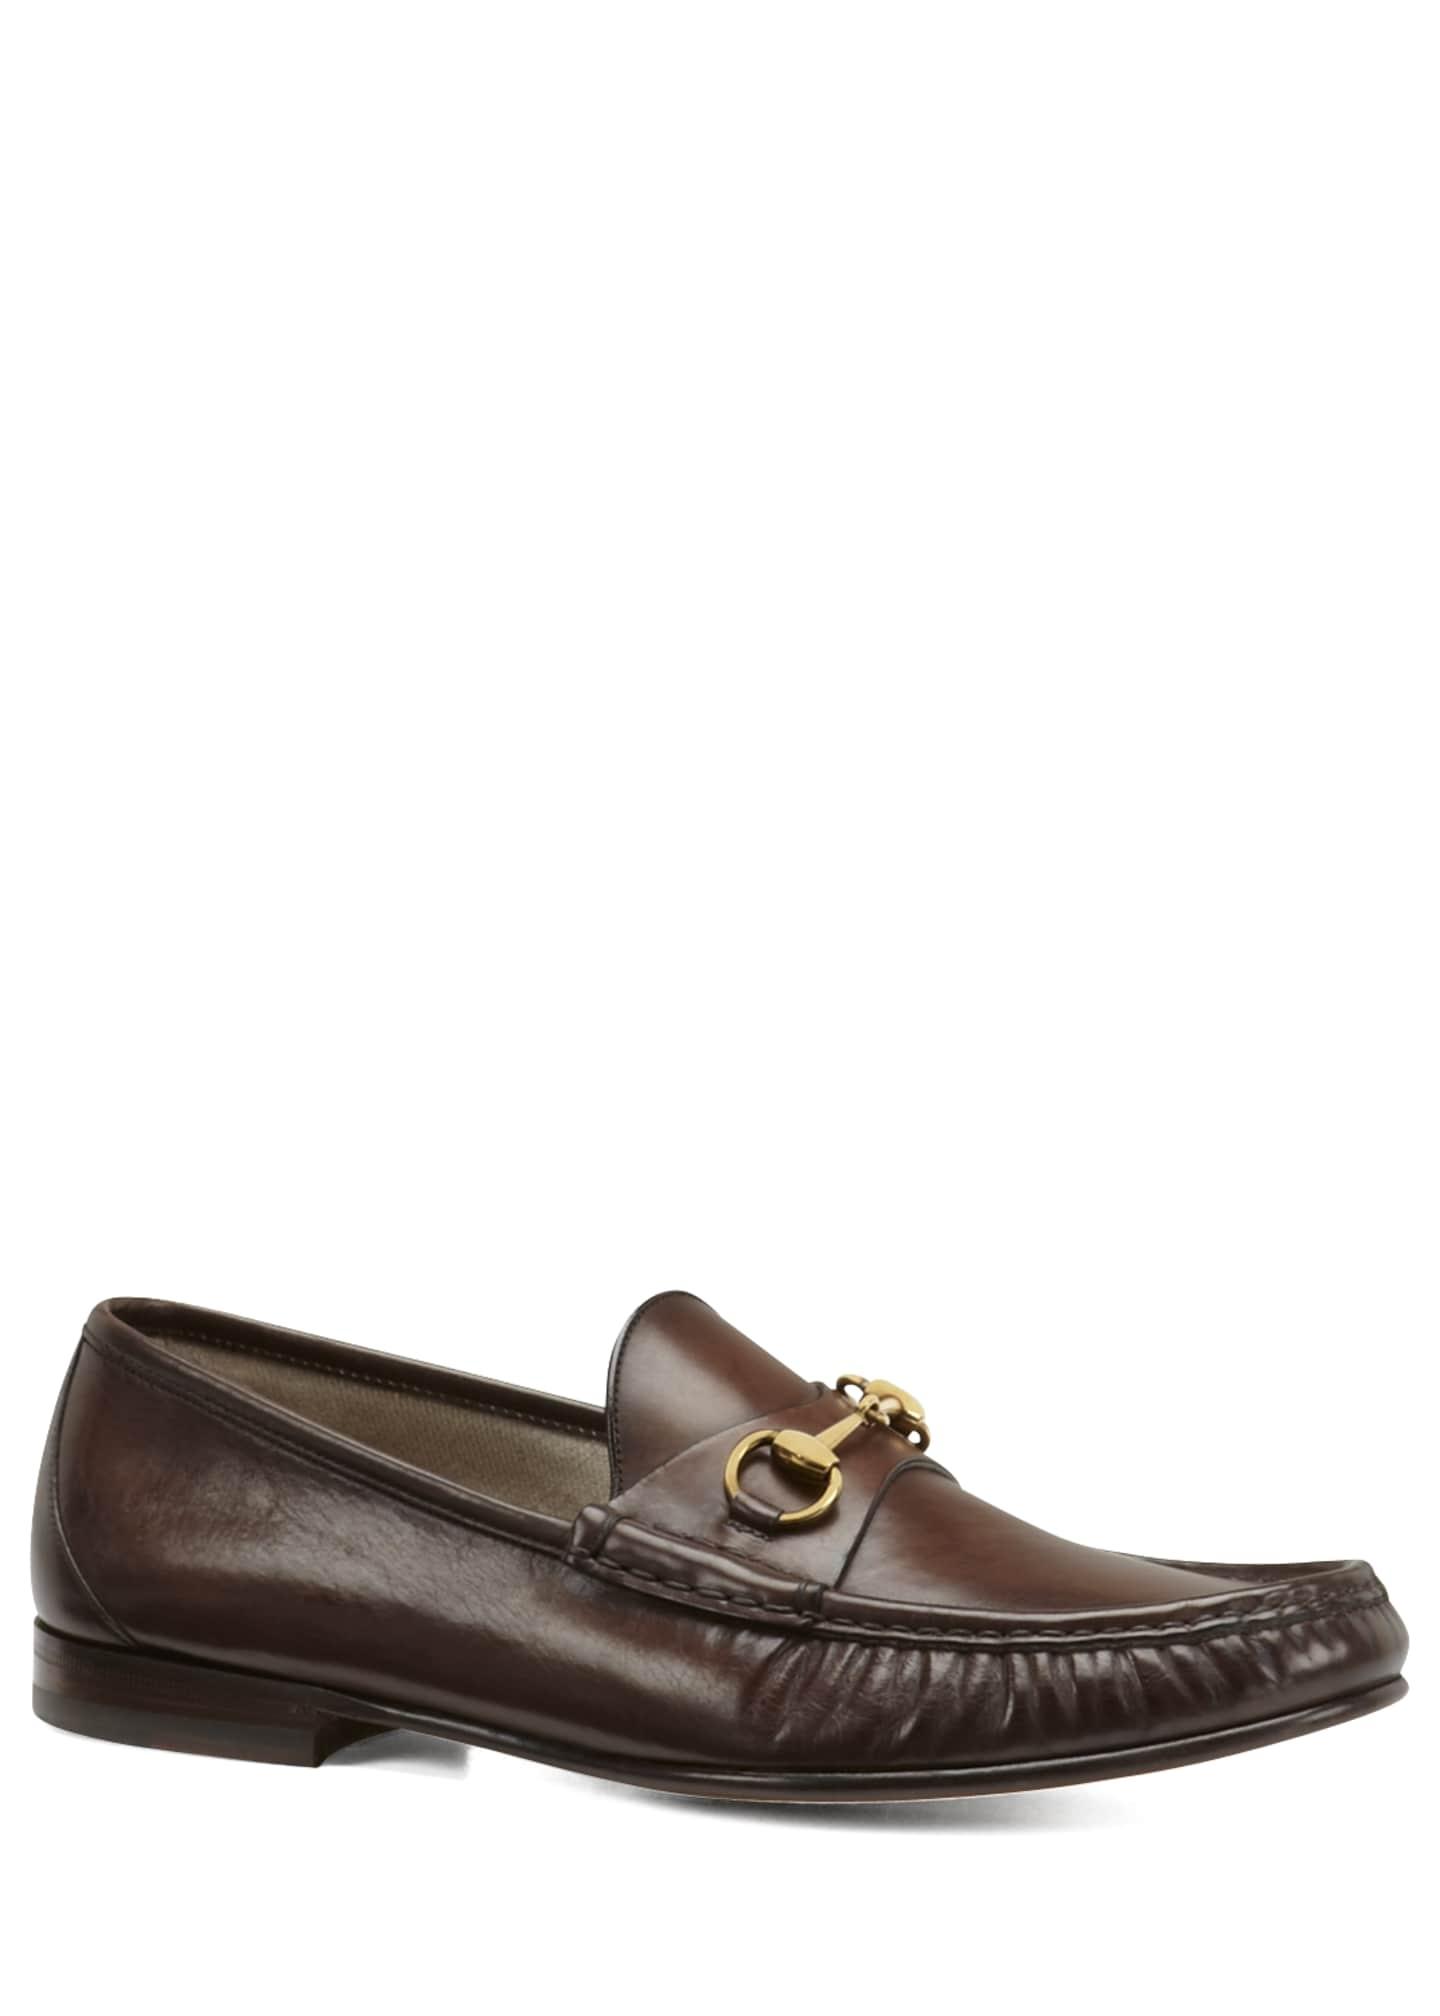 Gucci Leather Horsebit Loafer, Cocoa